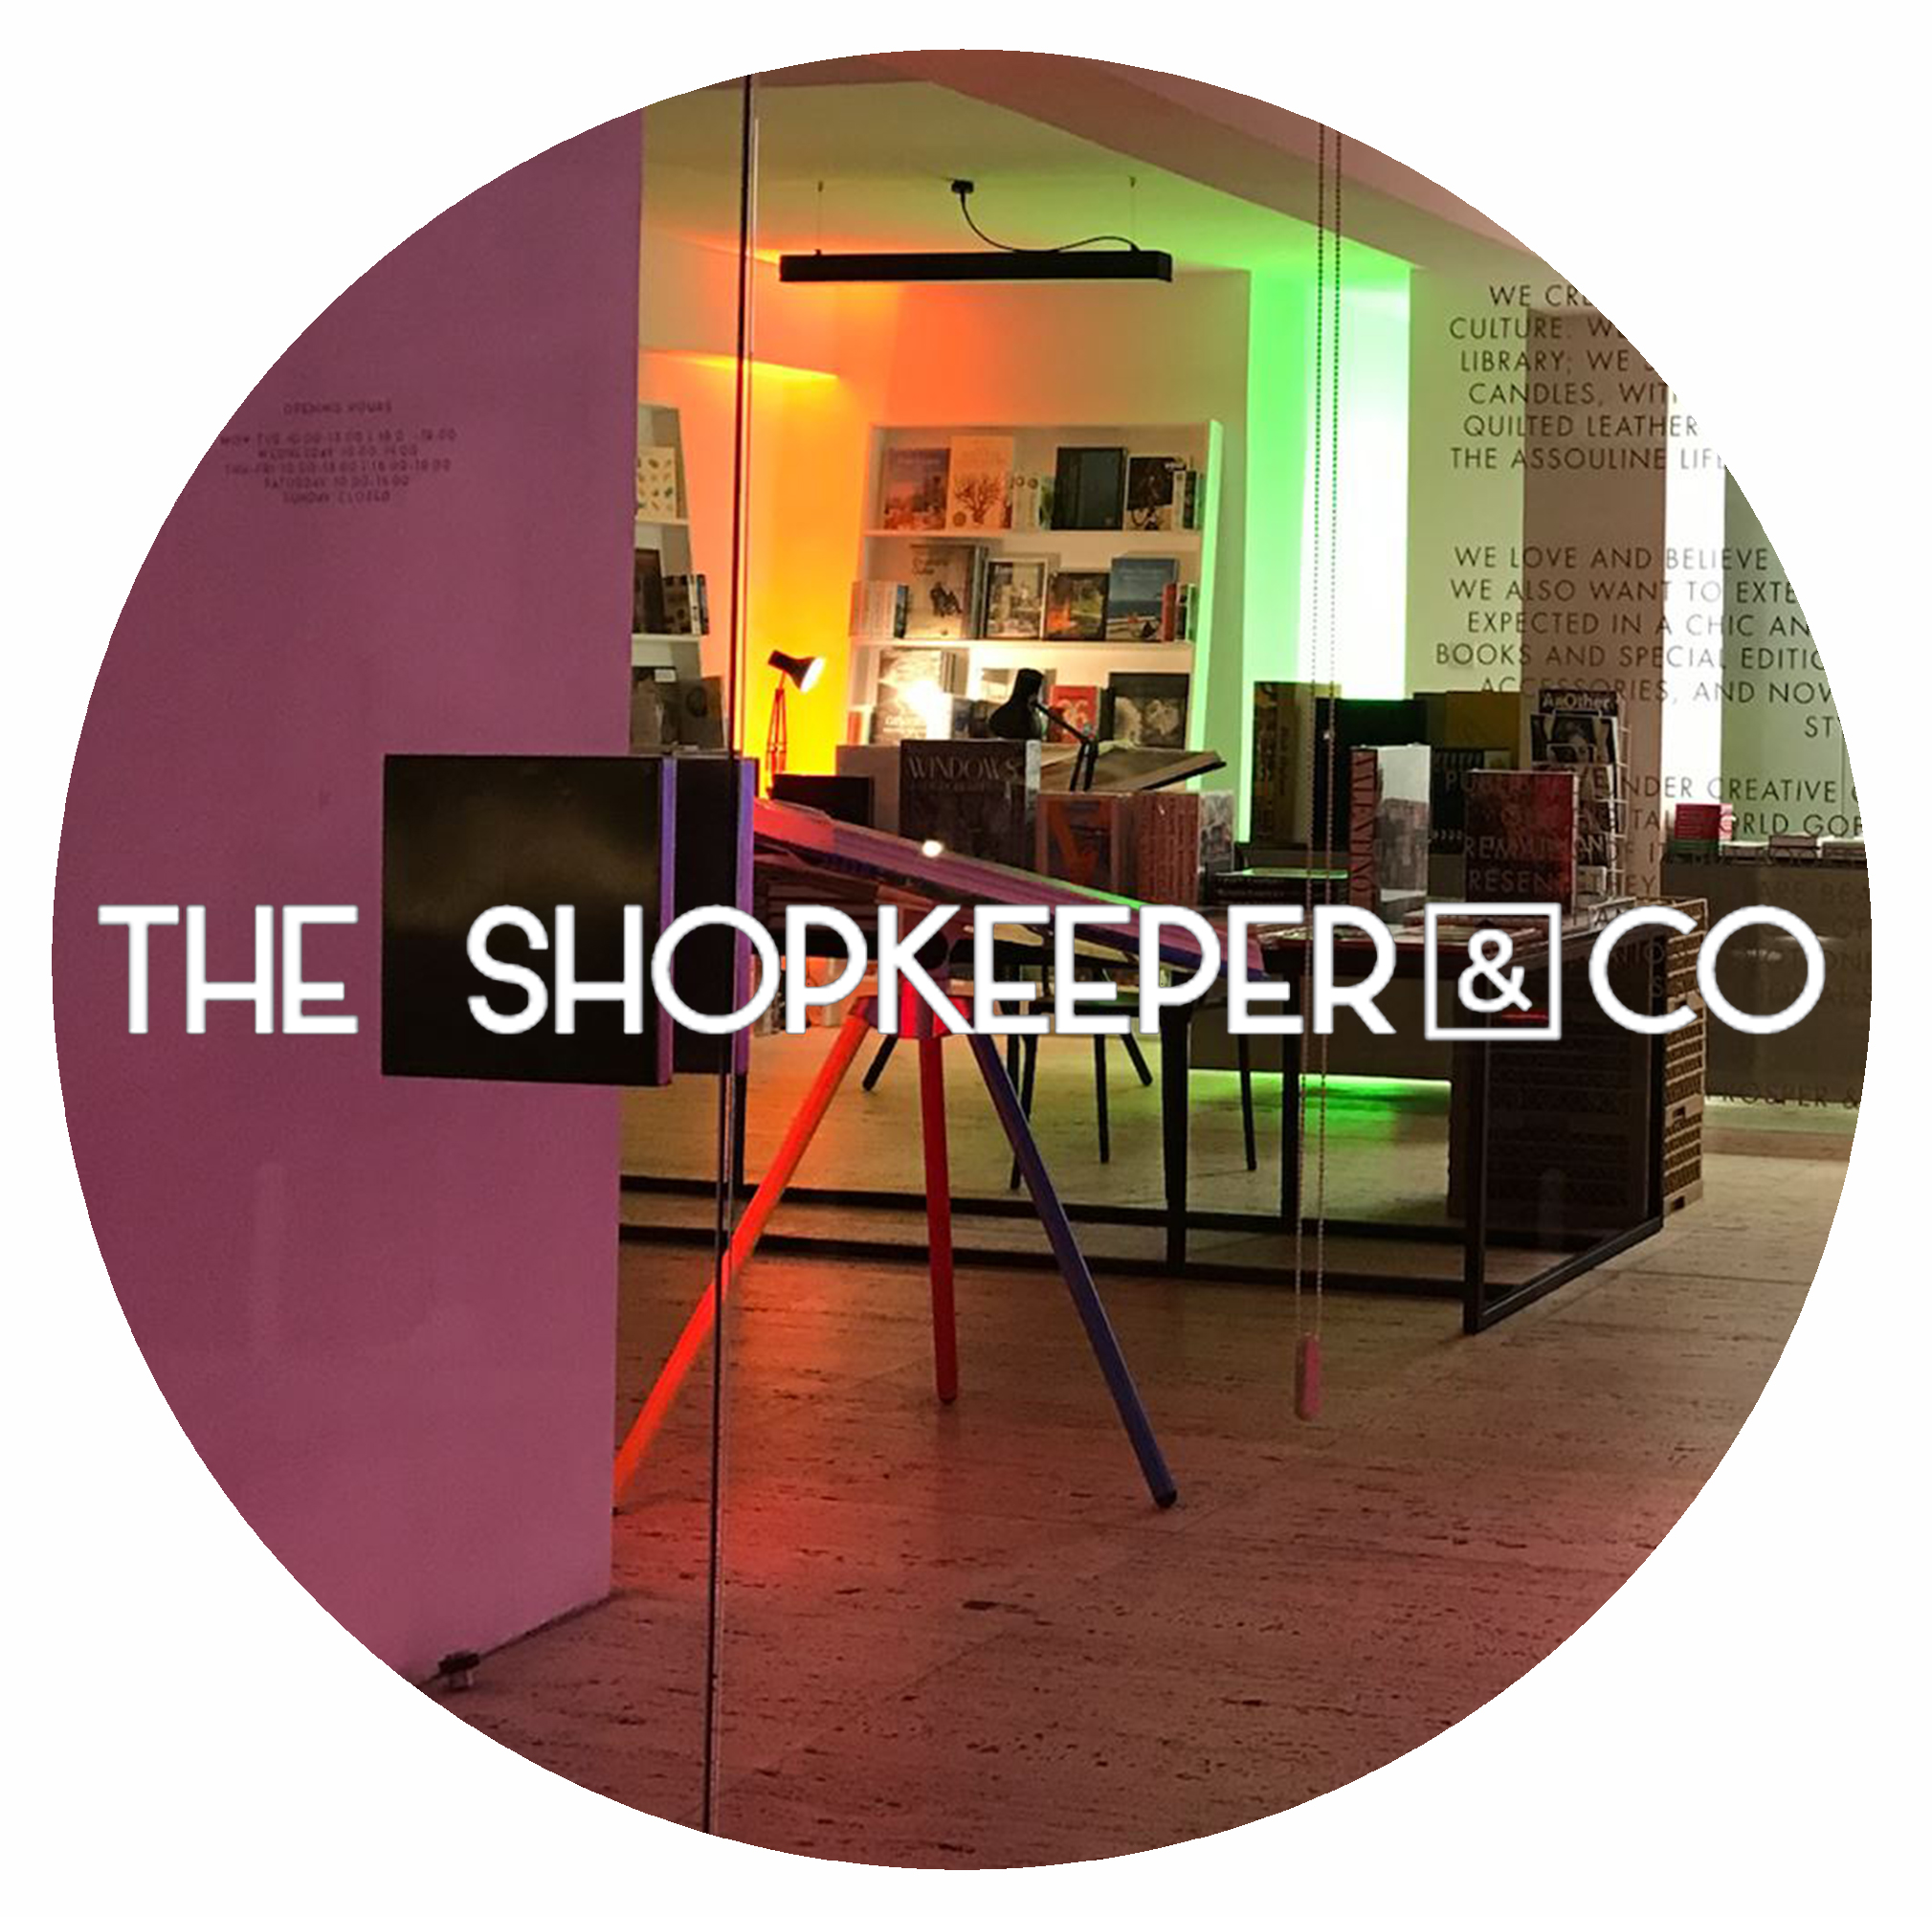 THE SHOPKEEPER & CO 7 Agias Zonis Street  Limassol, Cyprus